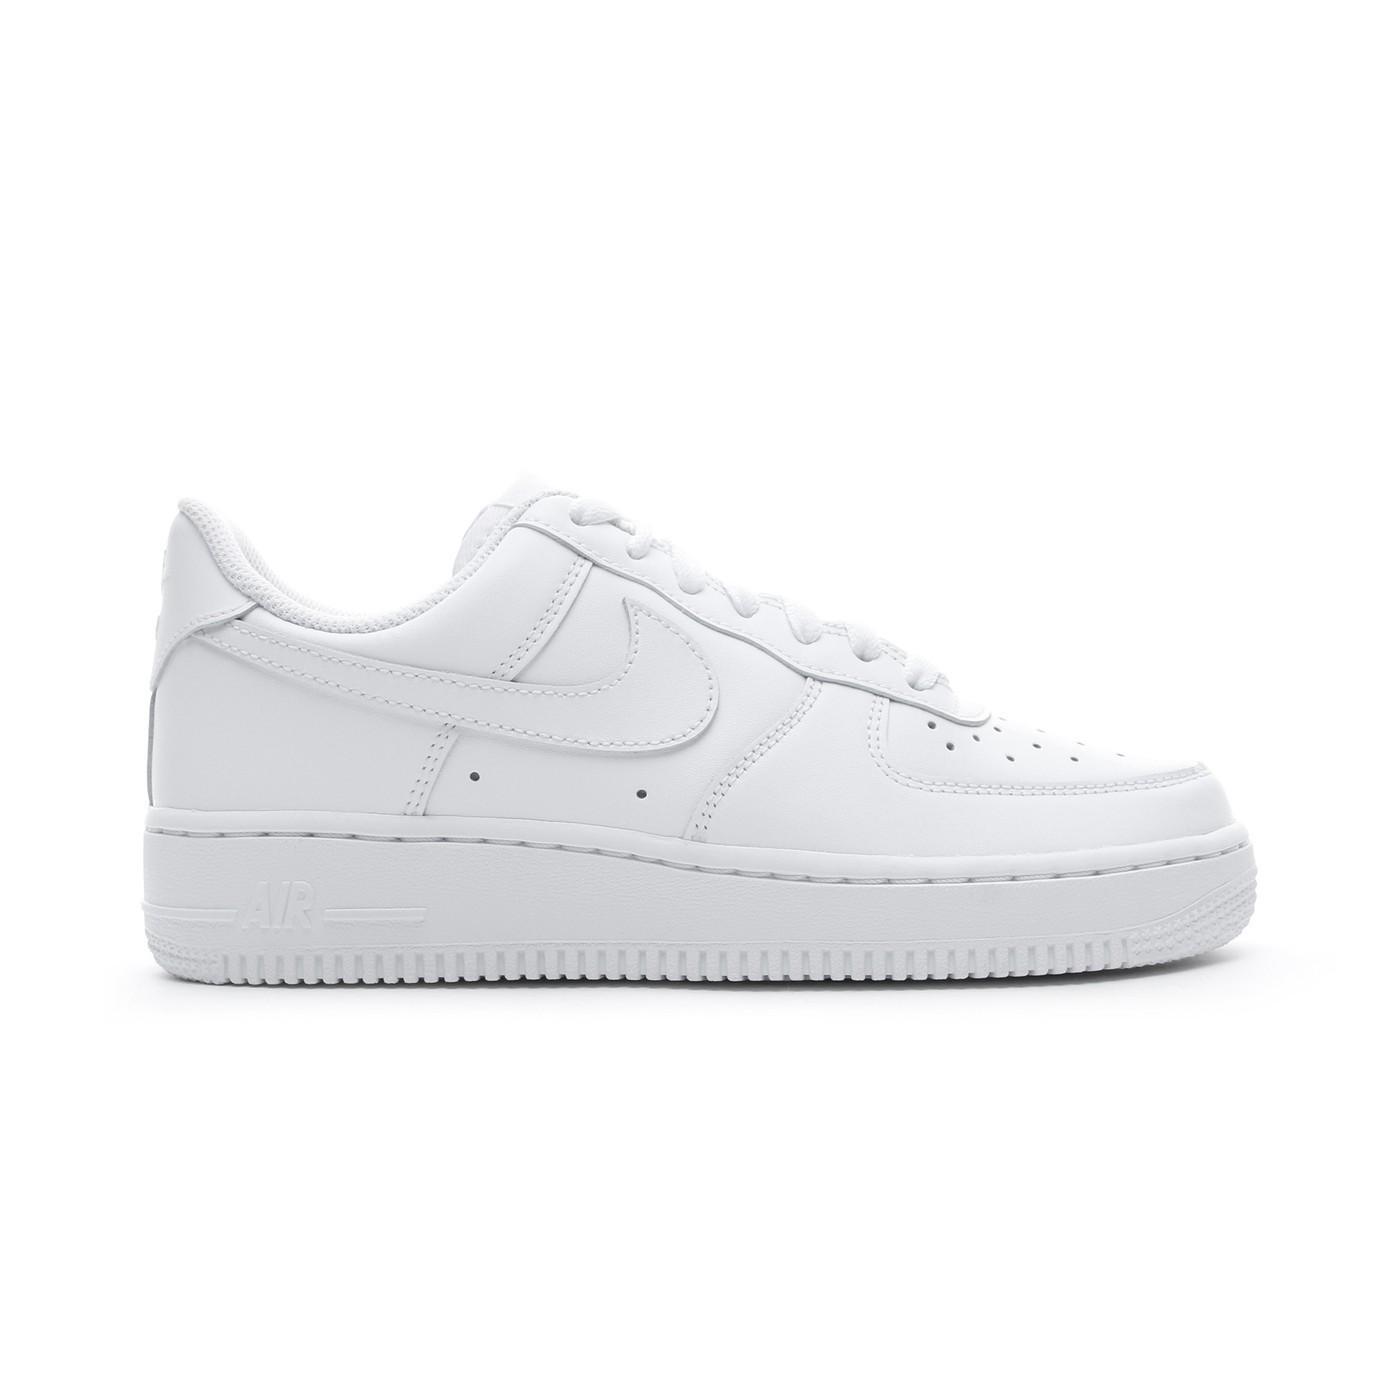 Actualizar Frente a ti Descuido  Nike Air Force 1 '07 Kadın Beyaz Sneaker Kadin Spor Ayakkabı & Sneaker  2570095 | SuperStep